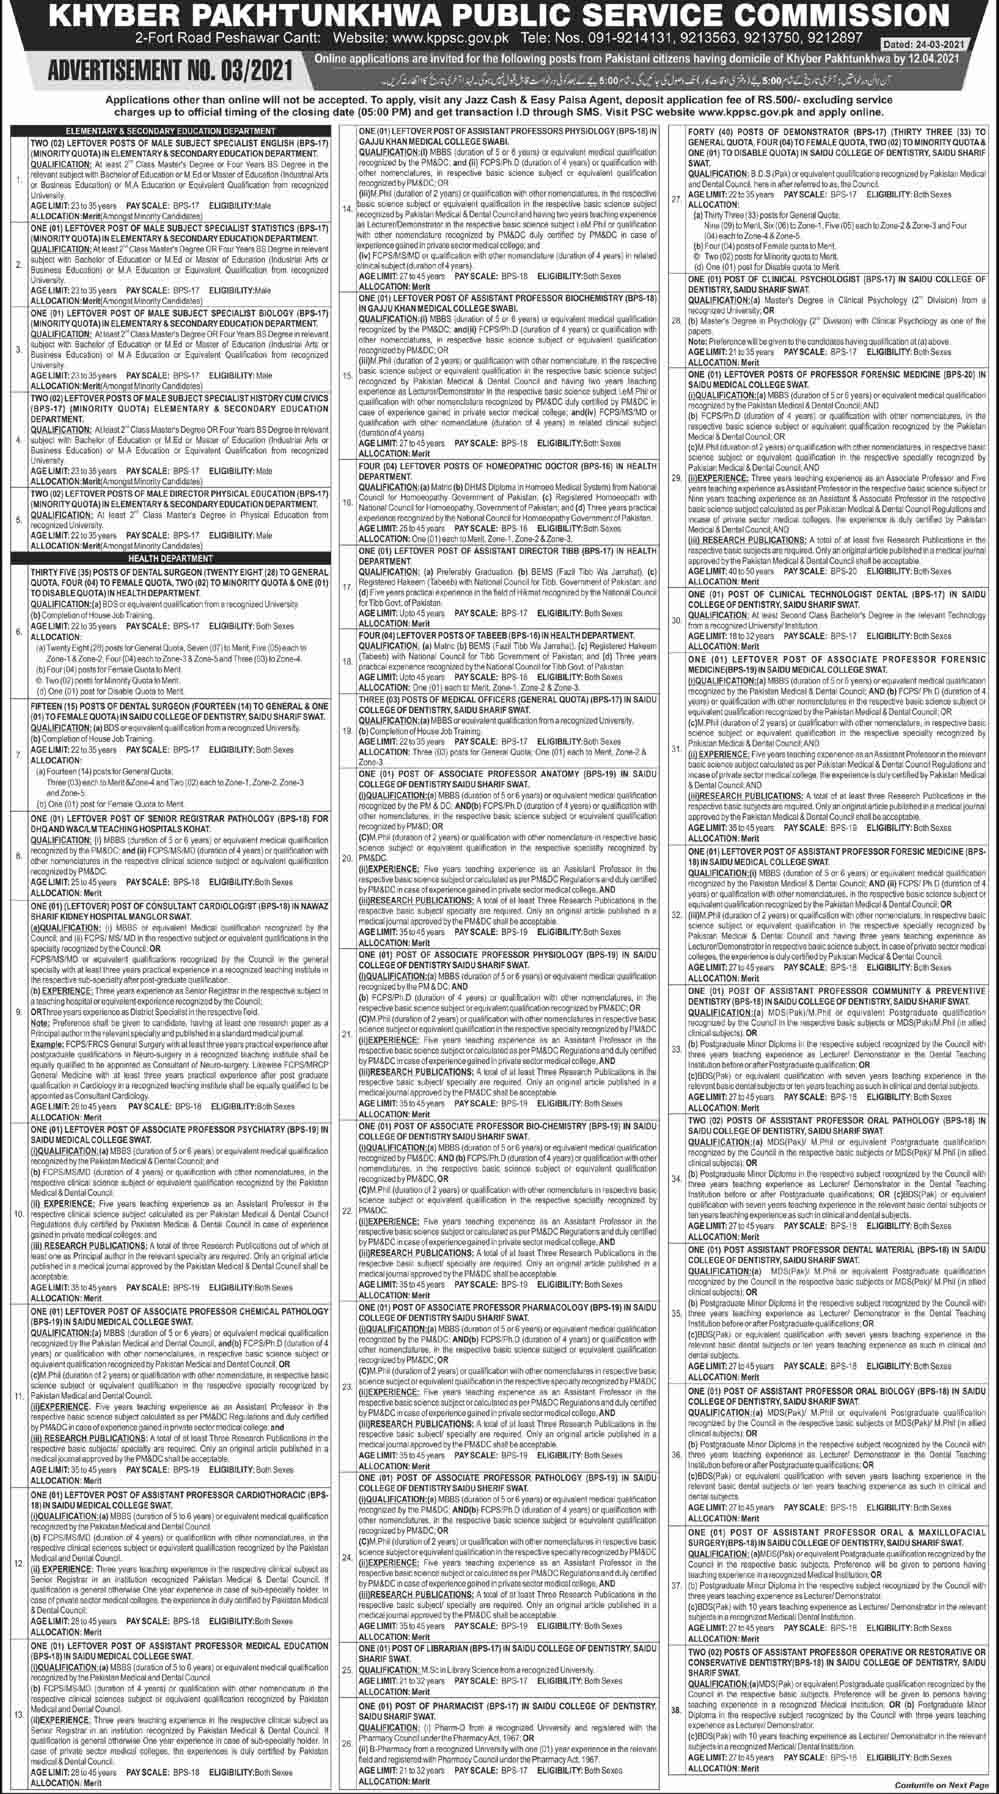 KPPSC Jobs March 2021 (265 Posts)